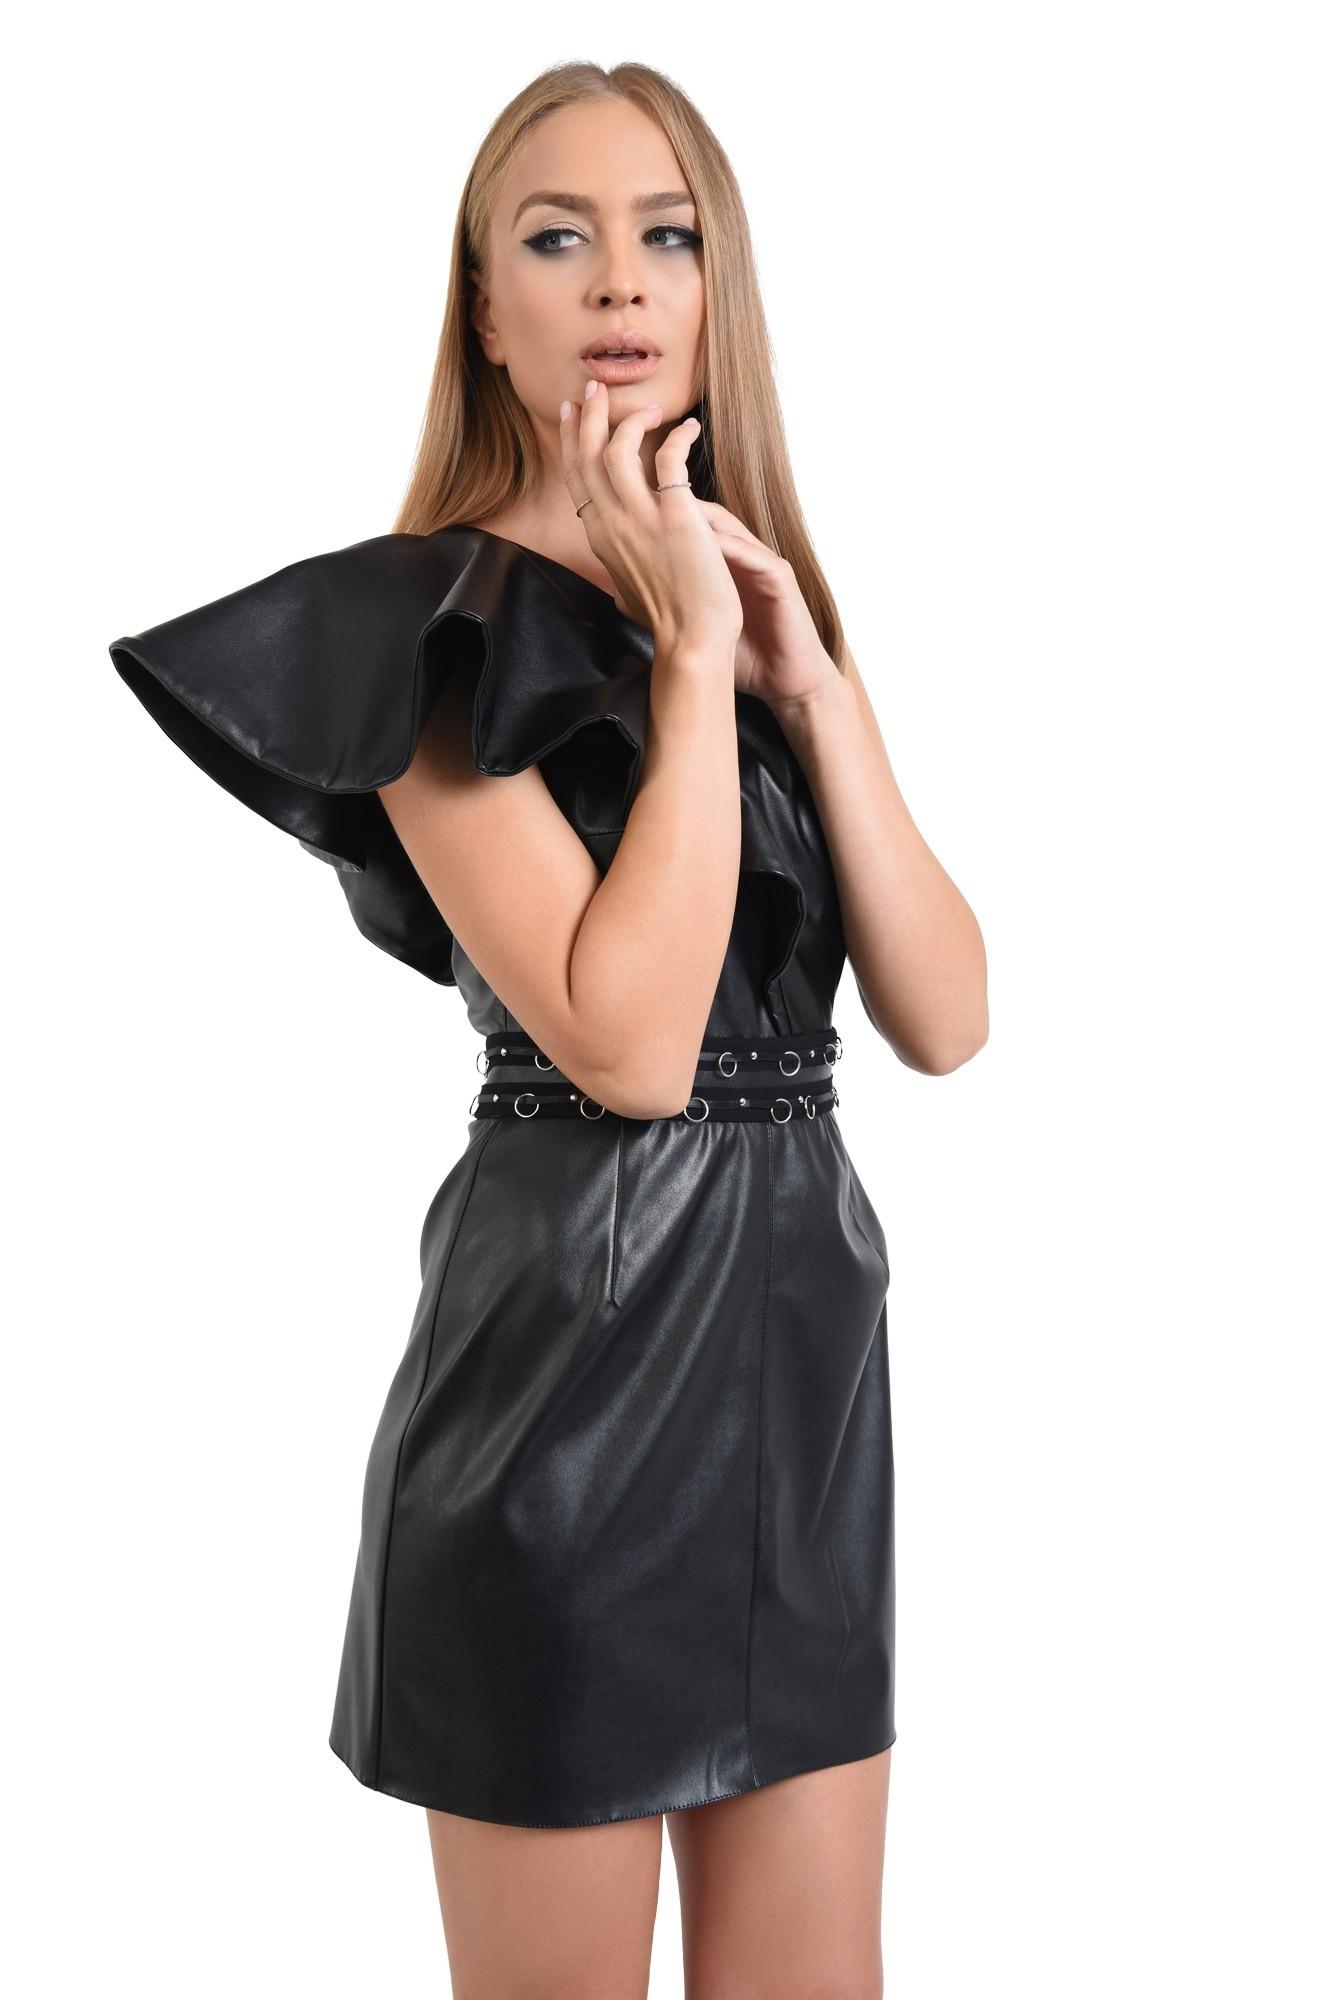 rochie neagra, piele ecologica, volan supradimensionat, decolteu asimetric